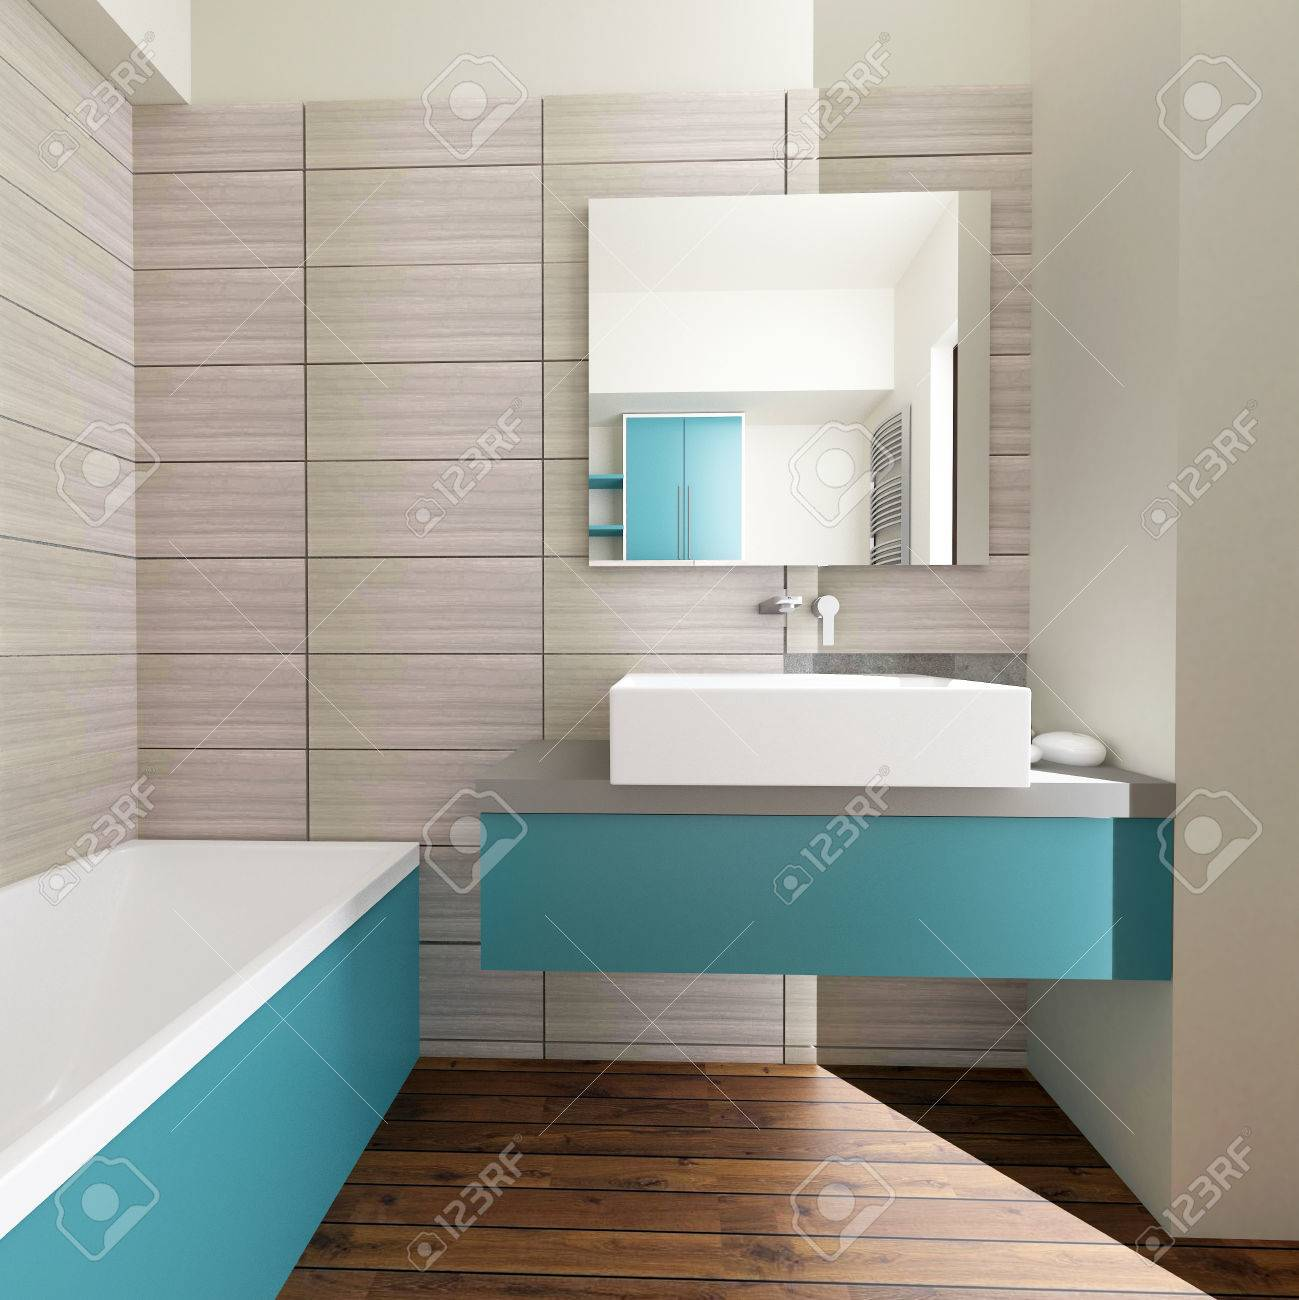 modern bathroom interior with grey wall tiles - 64599267